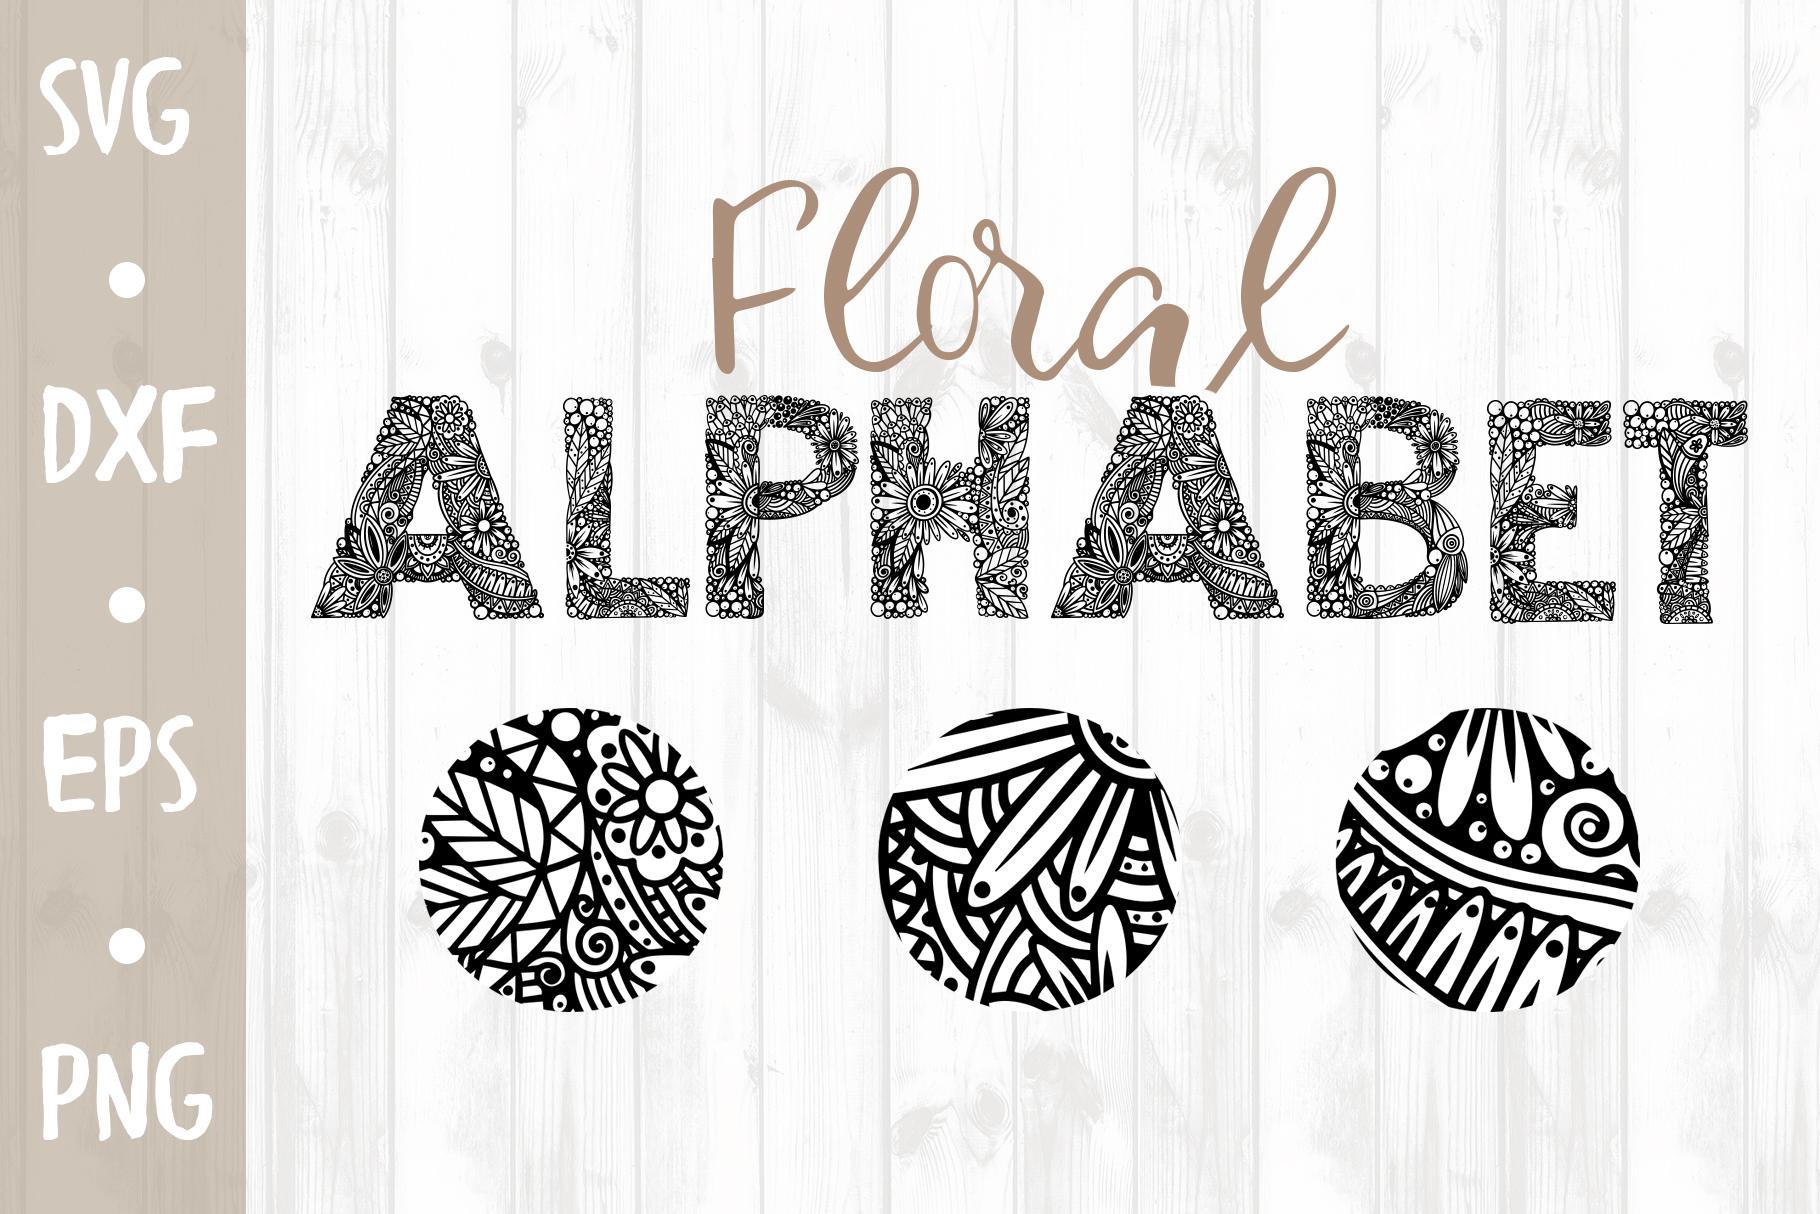 Floral Alphabet SVG CUT FILE example image 1